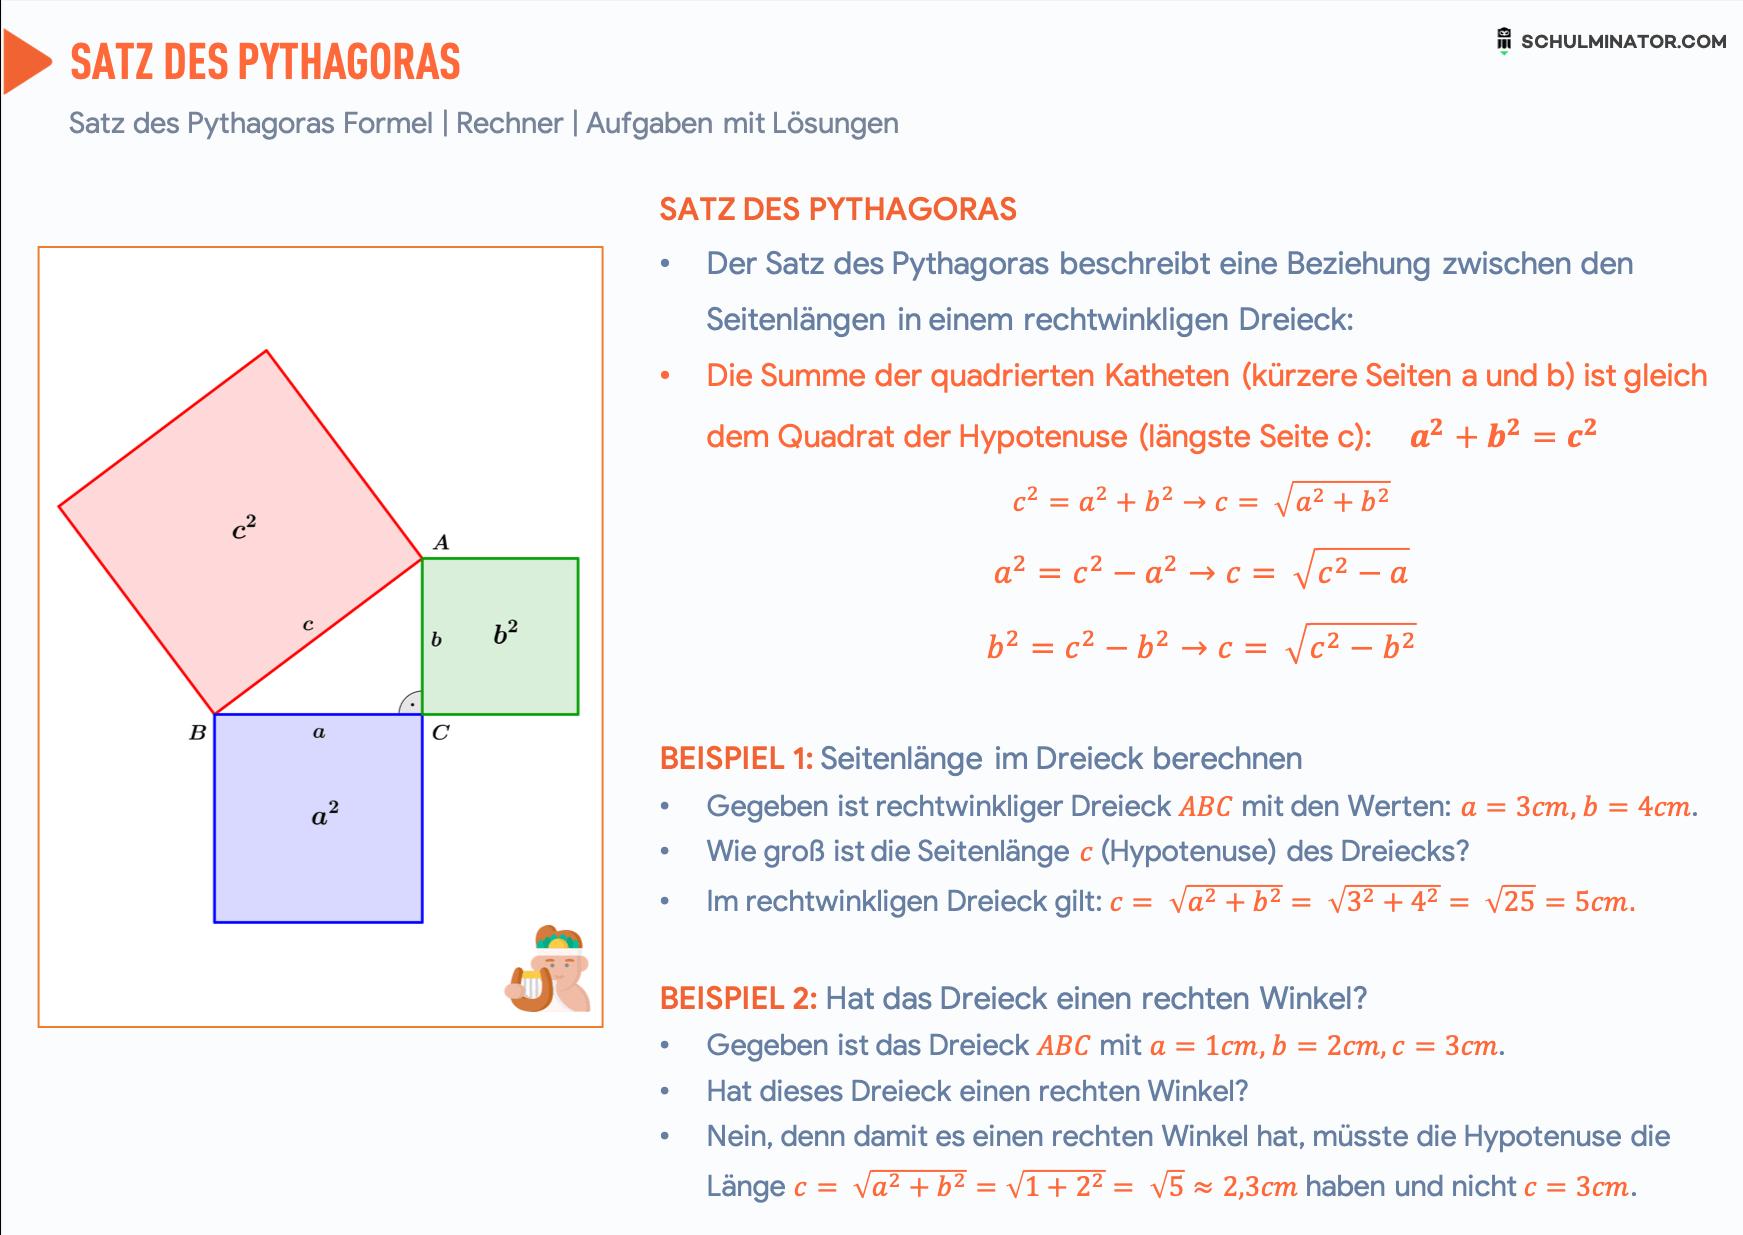 Satz Des Pythagoras Formel Anwendung Satz Des Pythagoras Lernen Tipps Schule Mathe Formeln